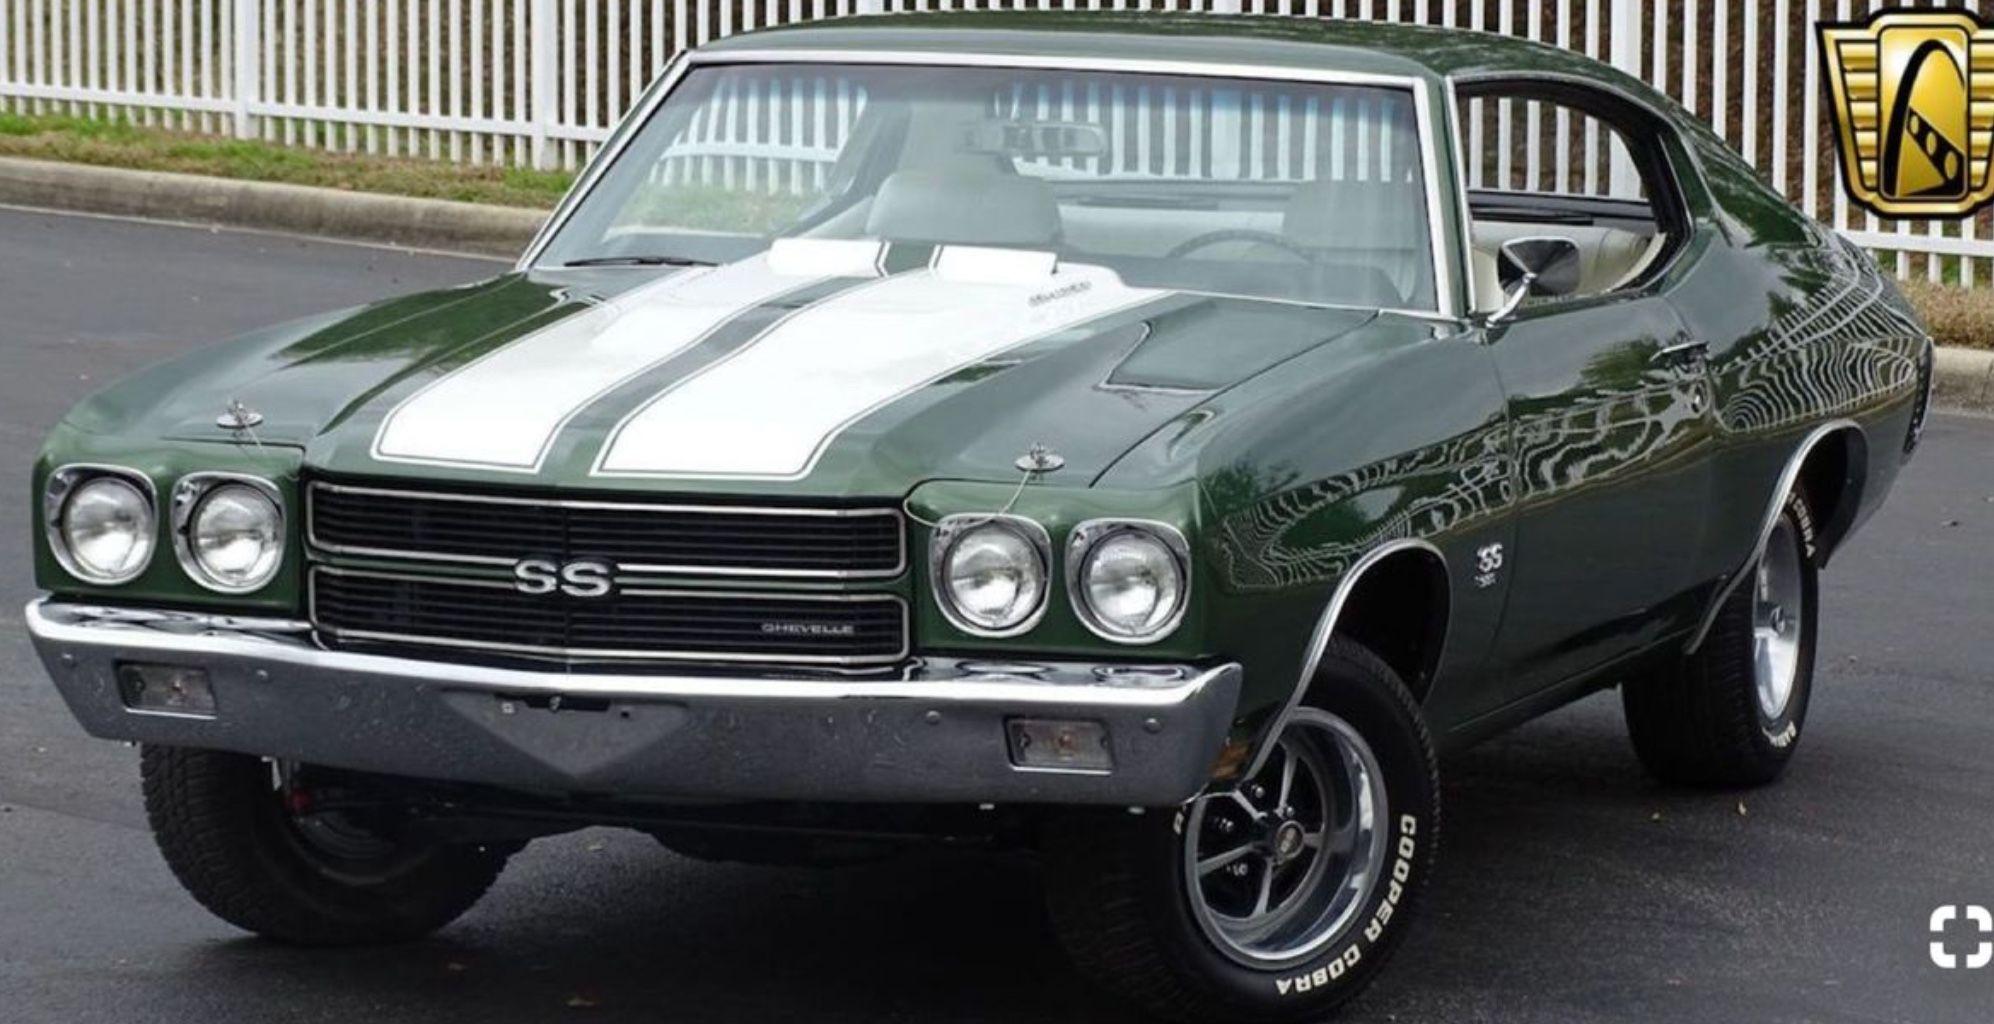 Original CHEVROLET CHEVY CHEVELLE ss 1969 396 1971 454 muscle us car t-shirt